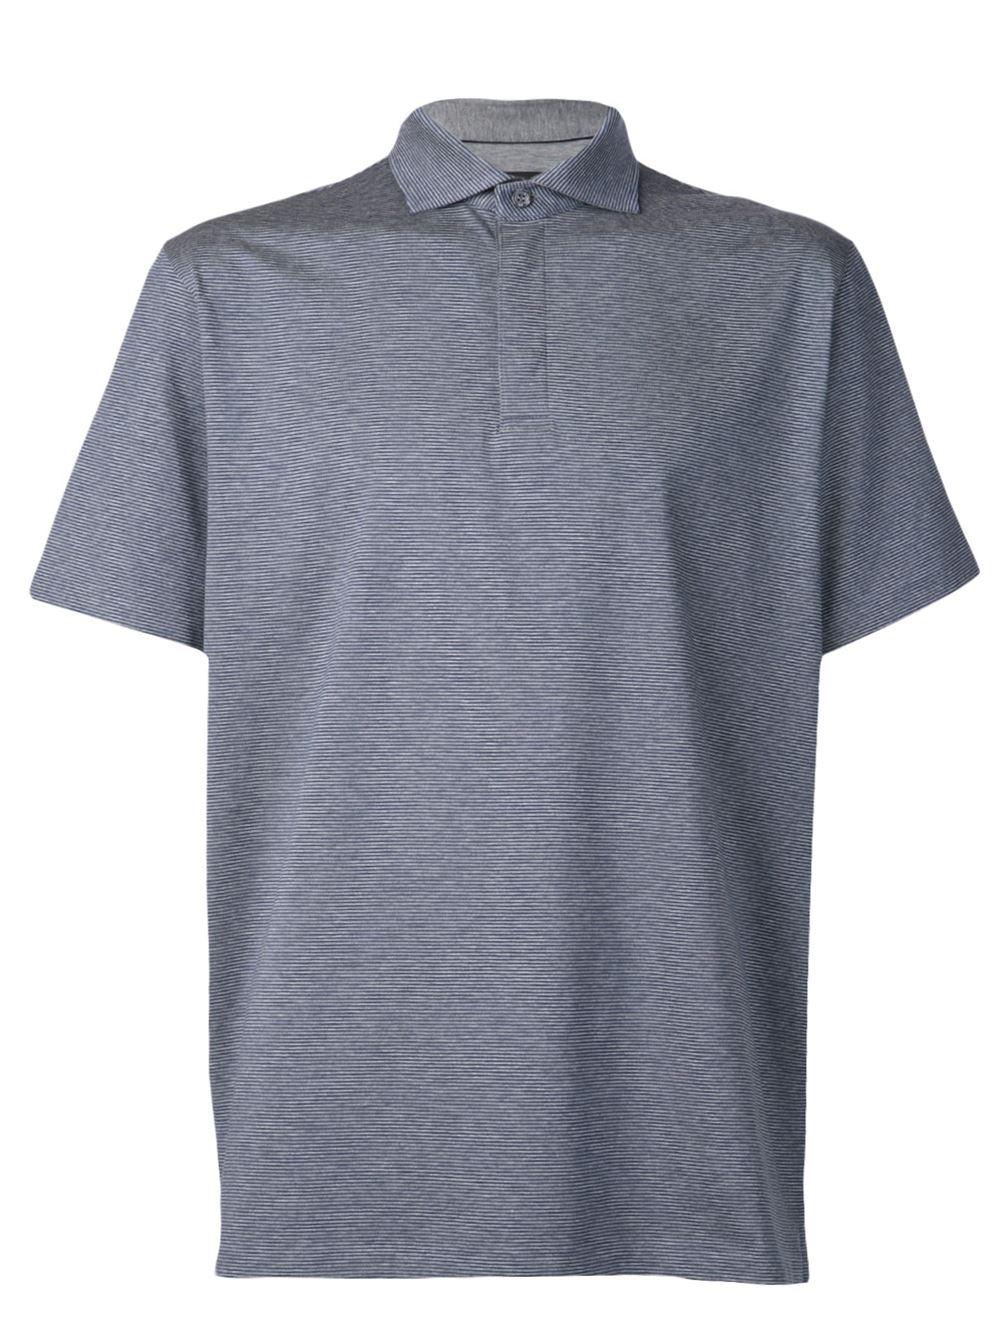 ermenegildo zegna classic polo shirt in gray for men grey lyst. Black Bedroom Furniture Sets. Home Design Ideas